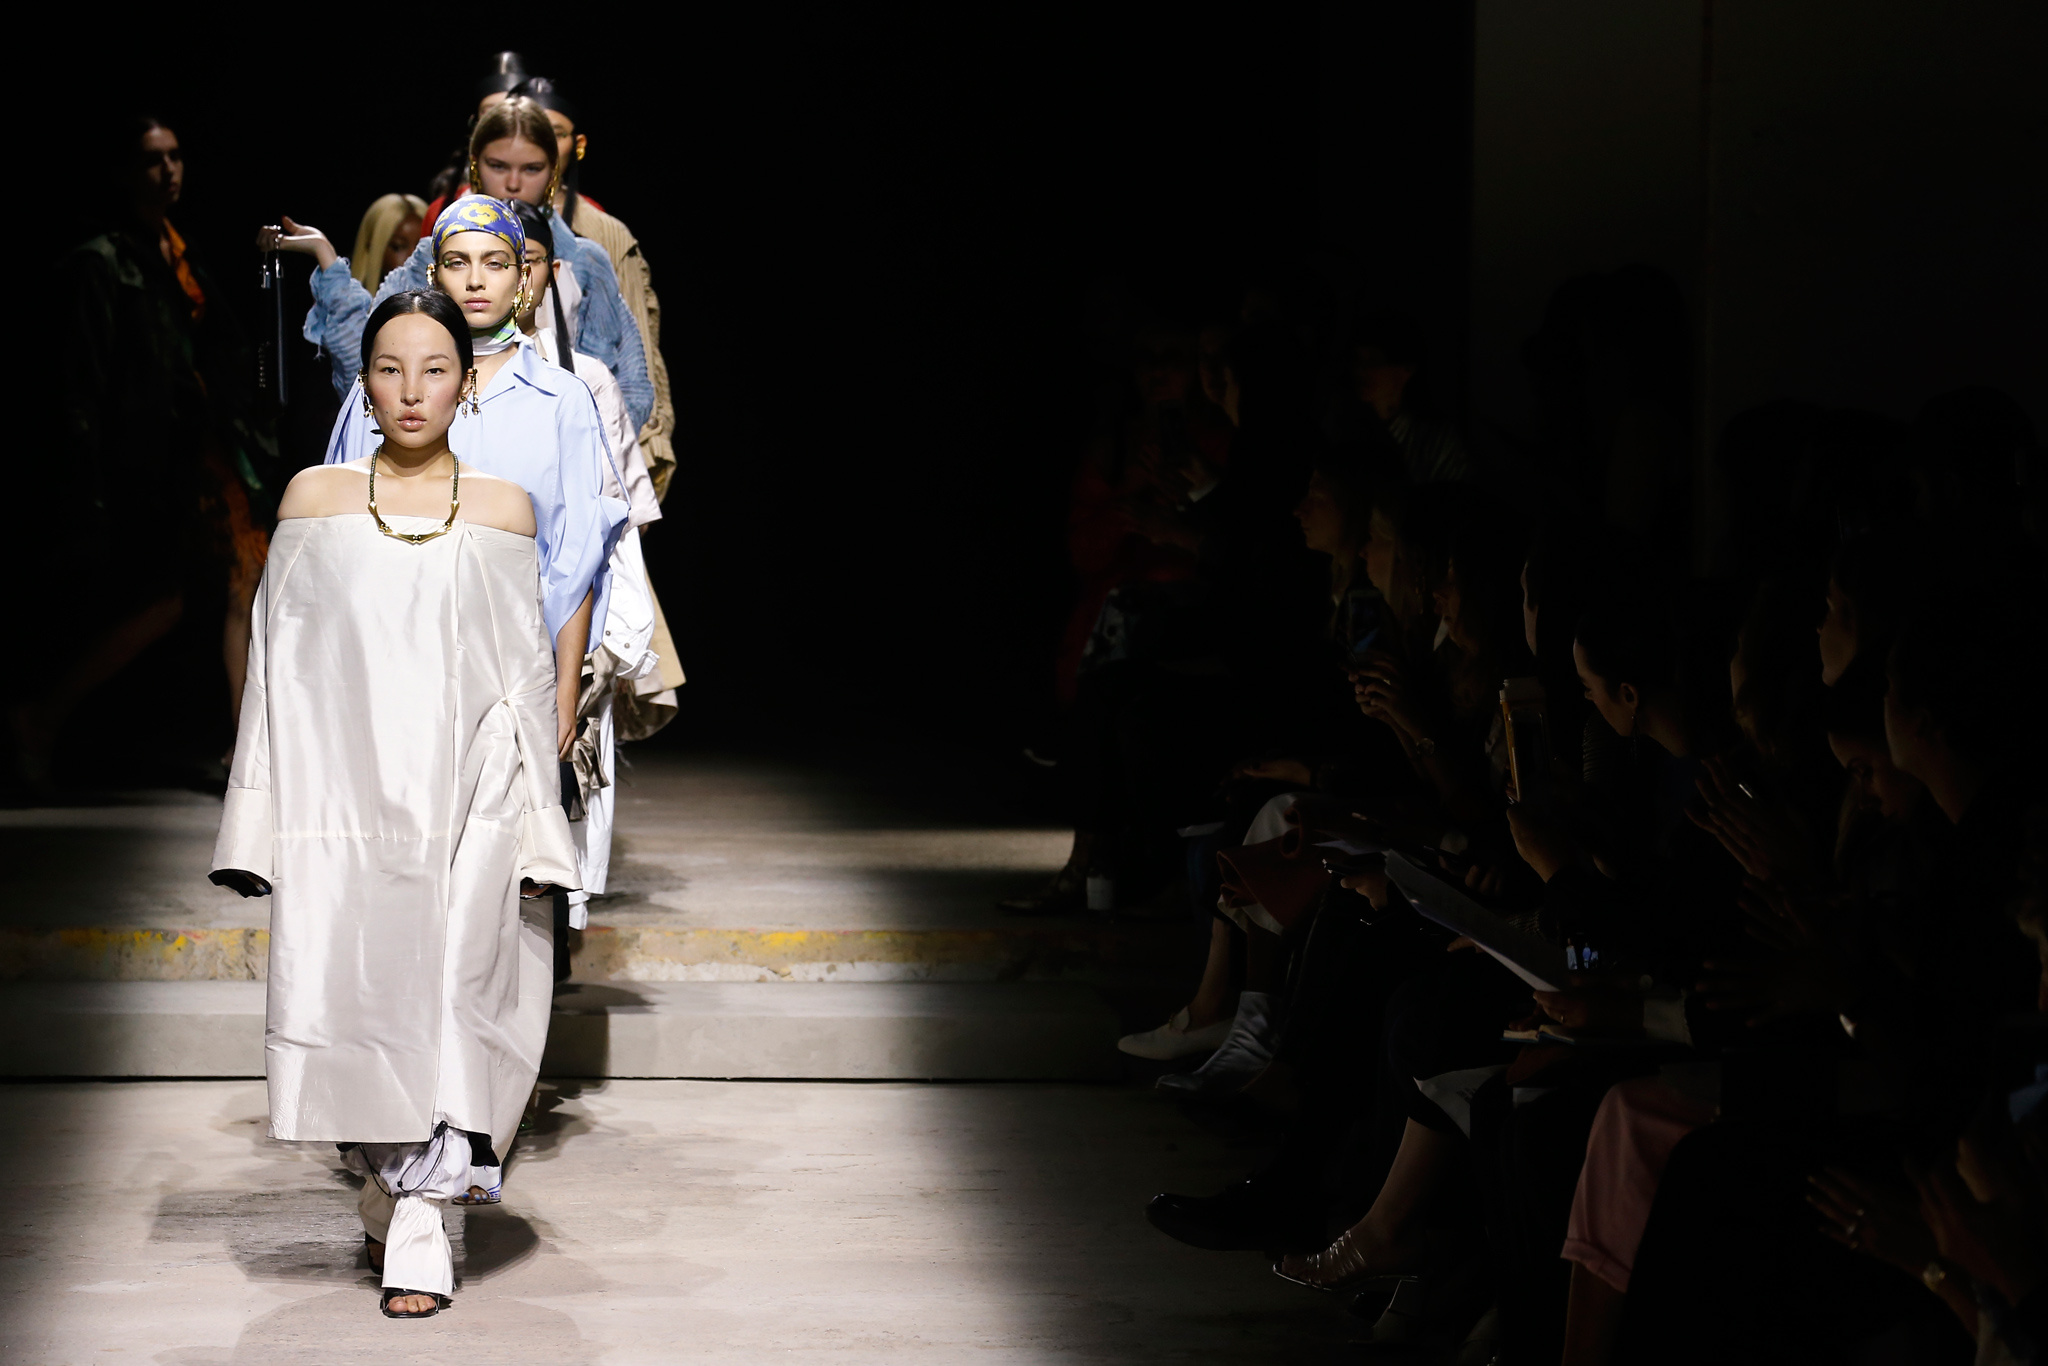 02_Asai-Fashion-East-RTW-spring-2018-london-fashion-week-14